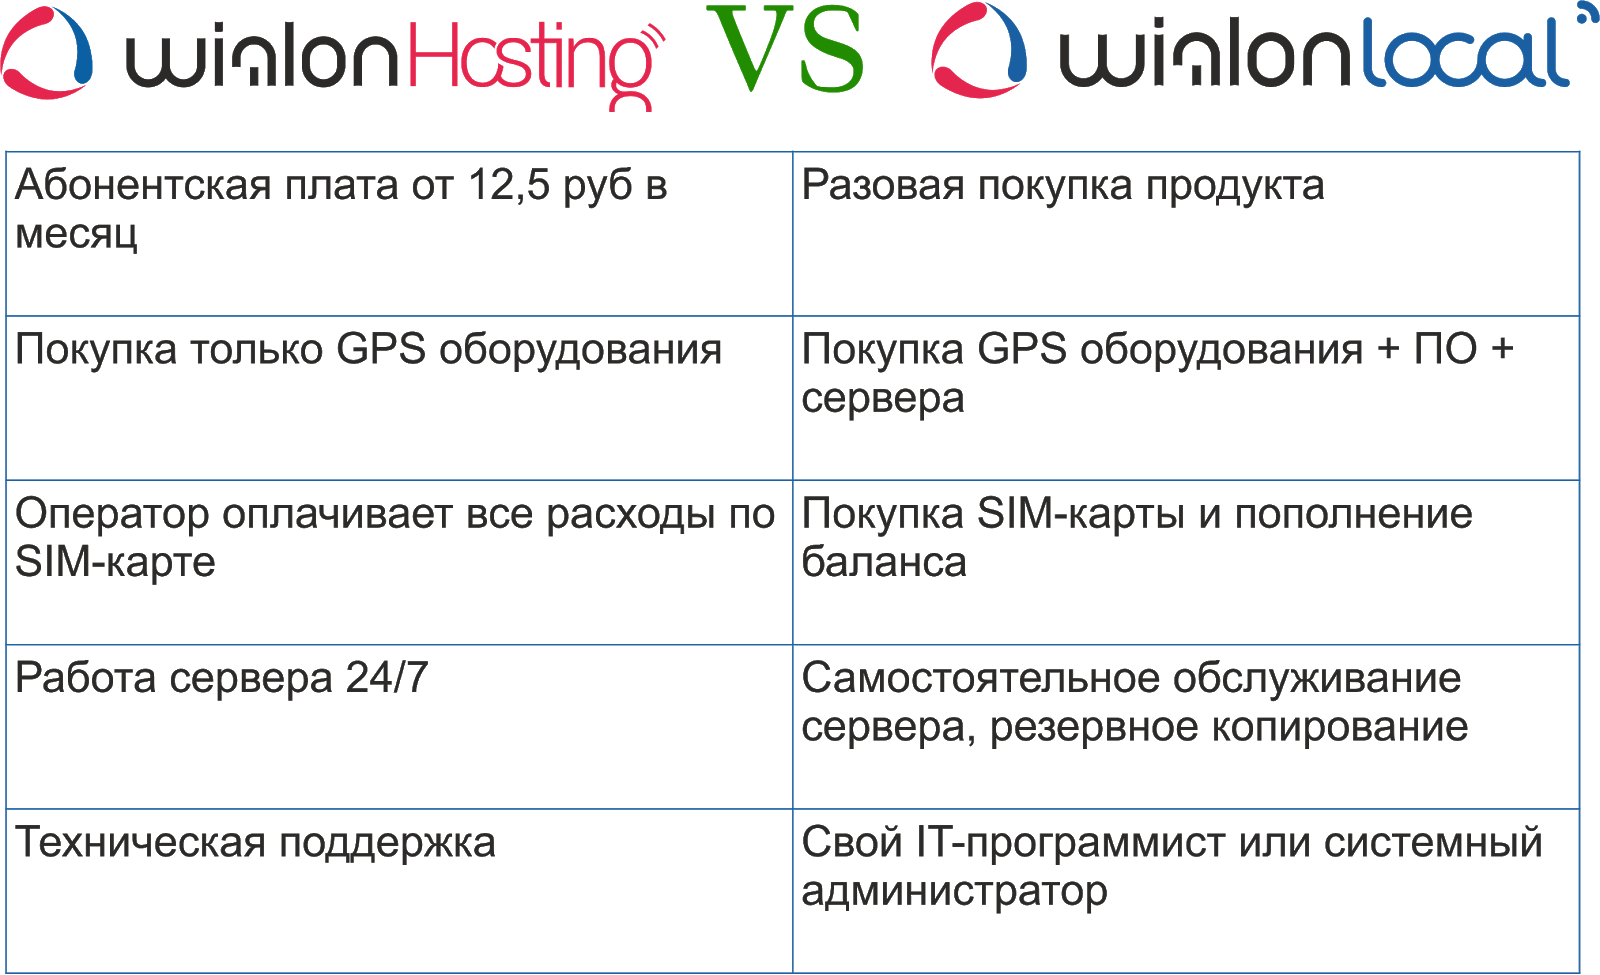 Сравнение Wialon Hosting и Wialon Local